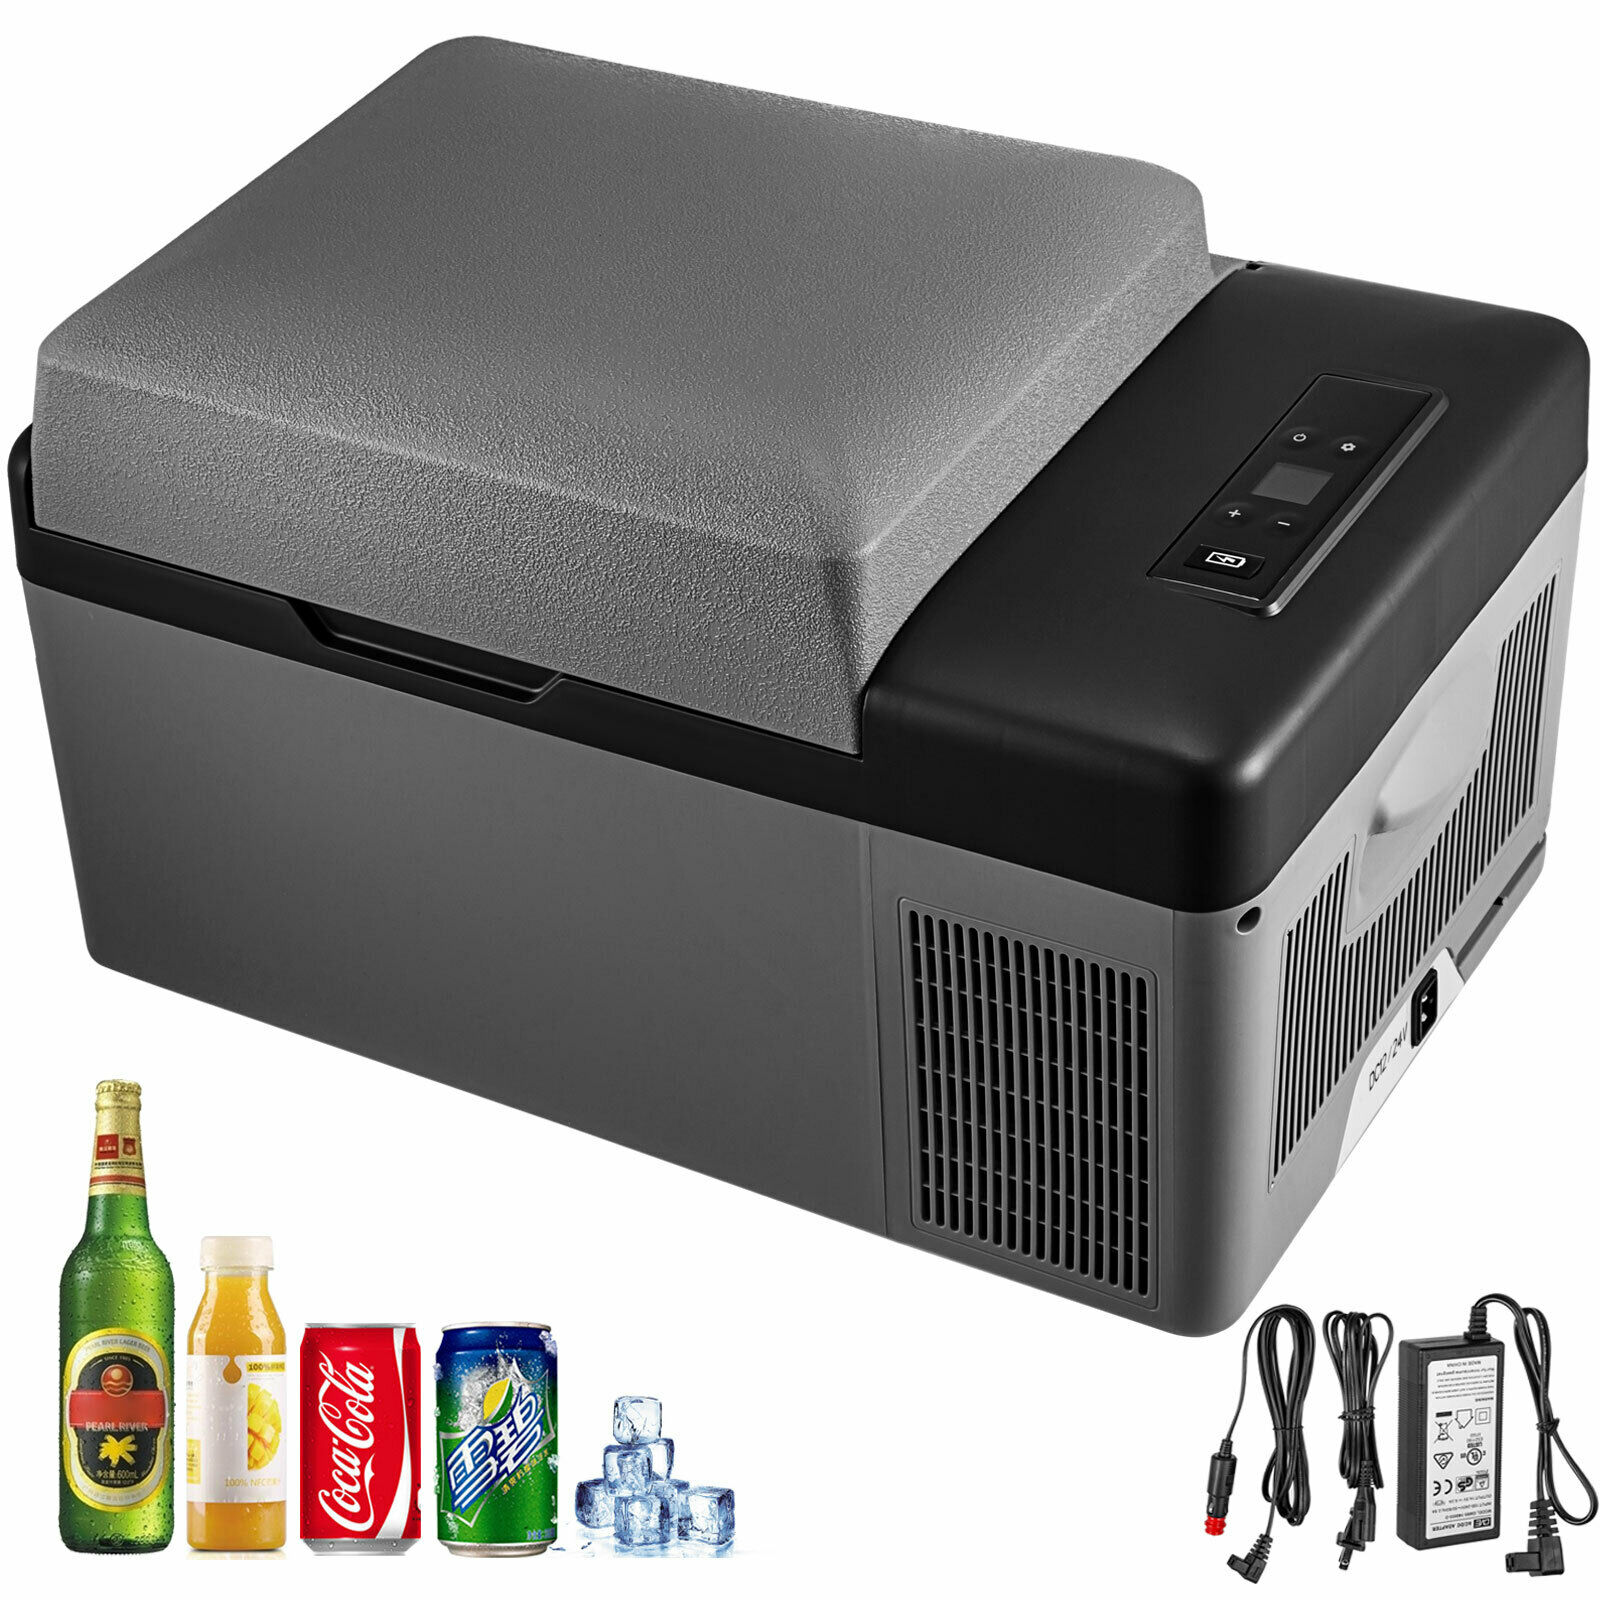 20L Portable Mini DC12V AC 220V Car Refrigerator Freezer Compressor Quick Cooling For Car Truck